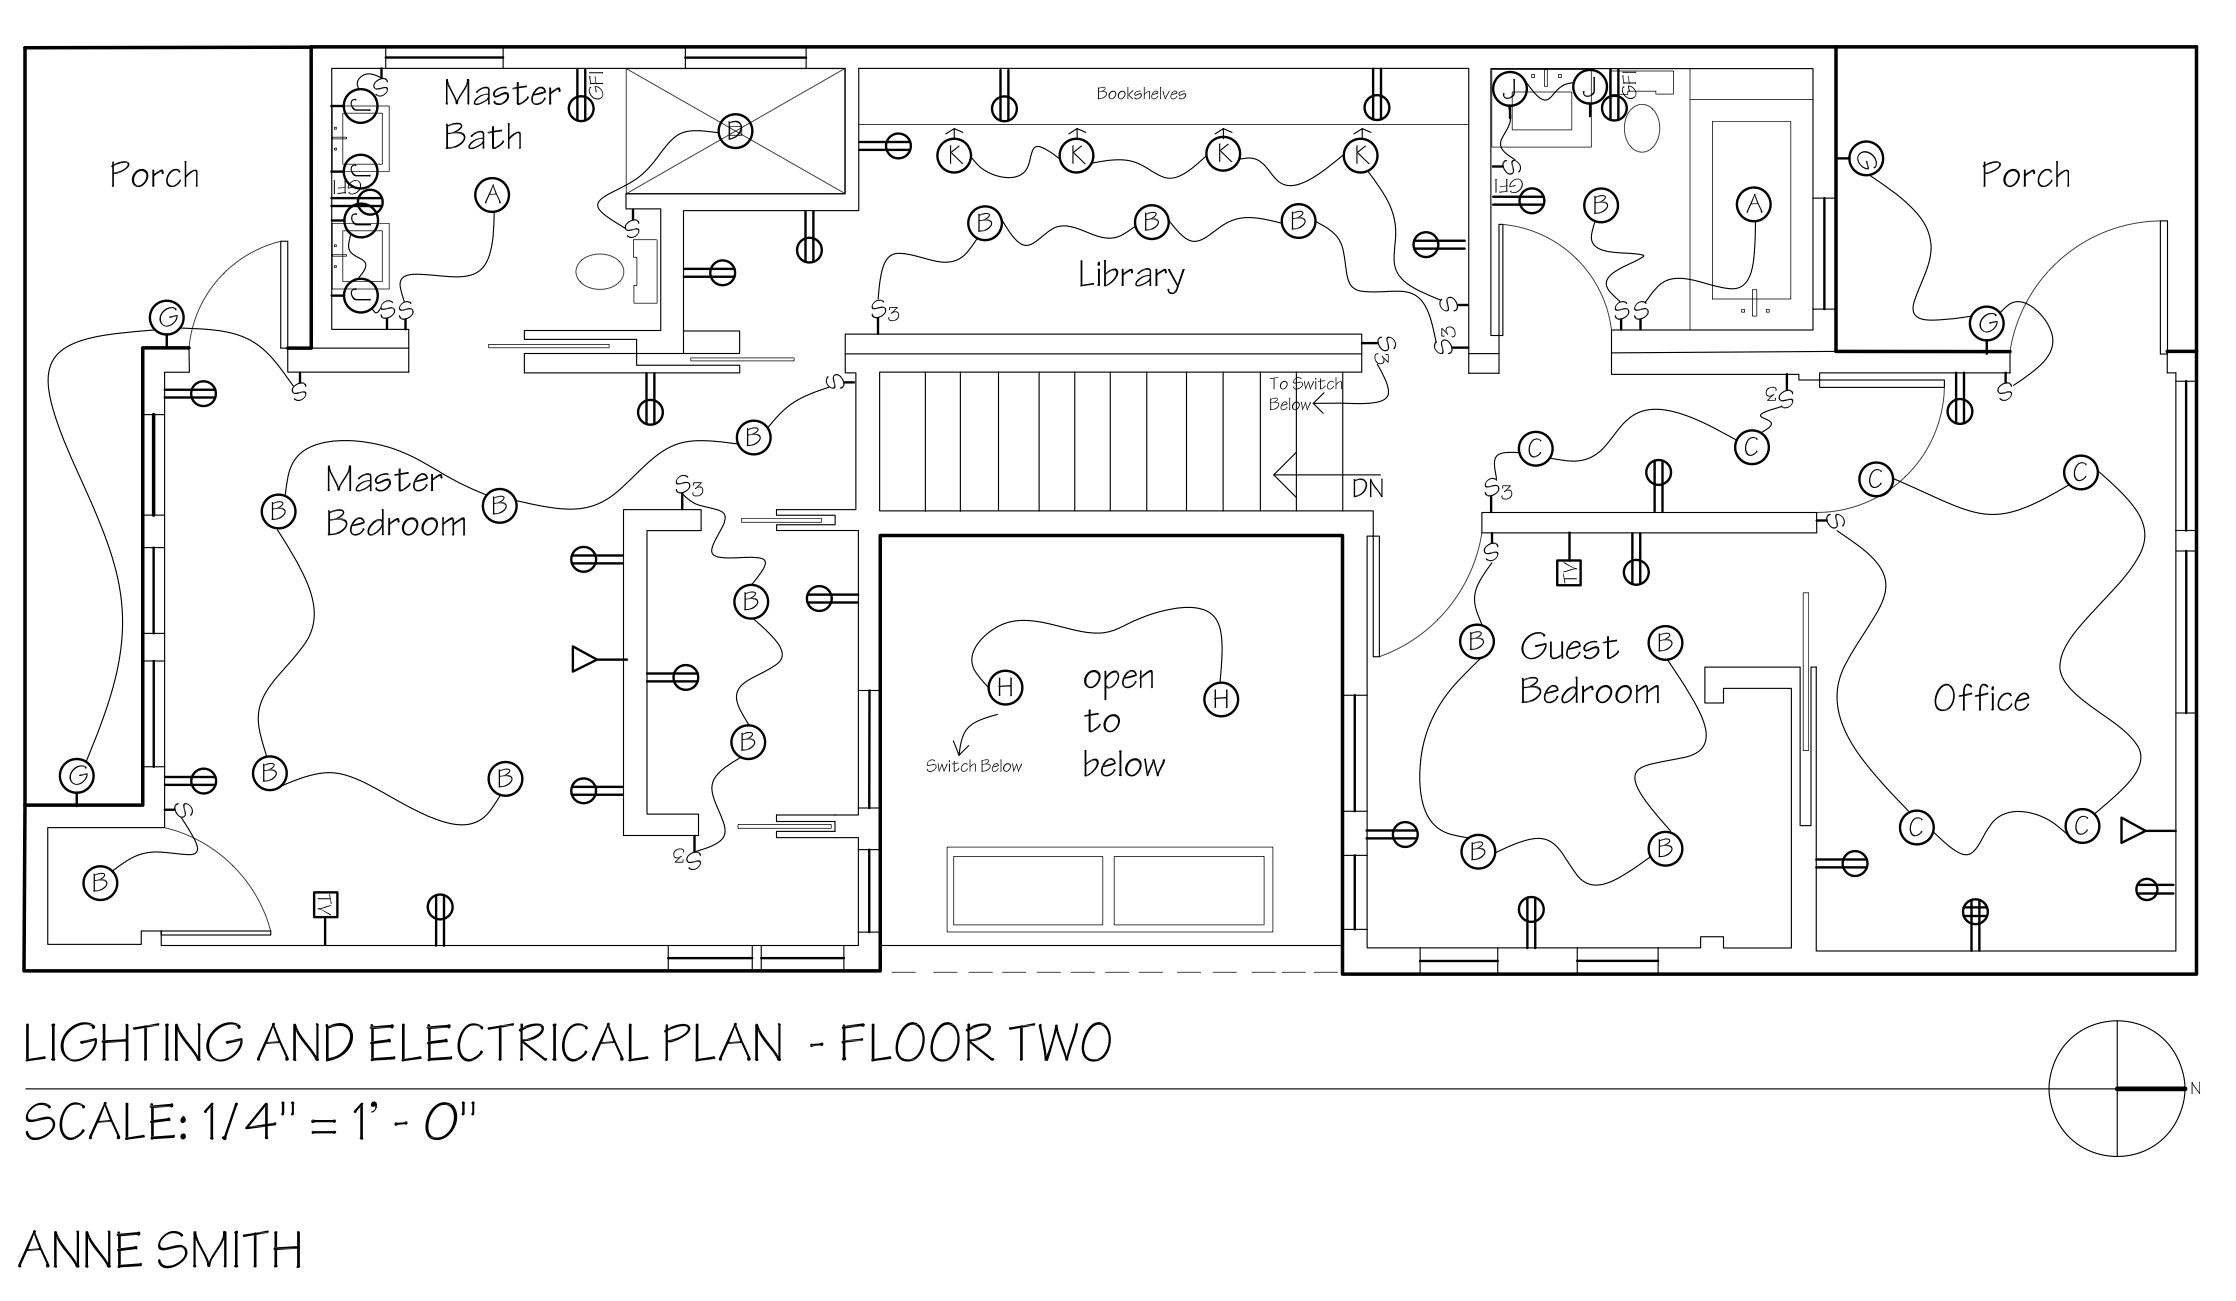 small resolution of image result for bedroom lighting floor plan